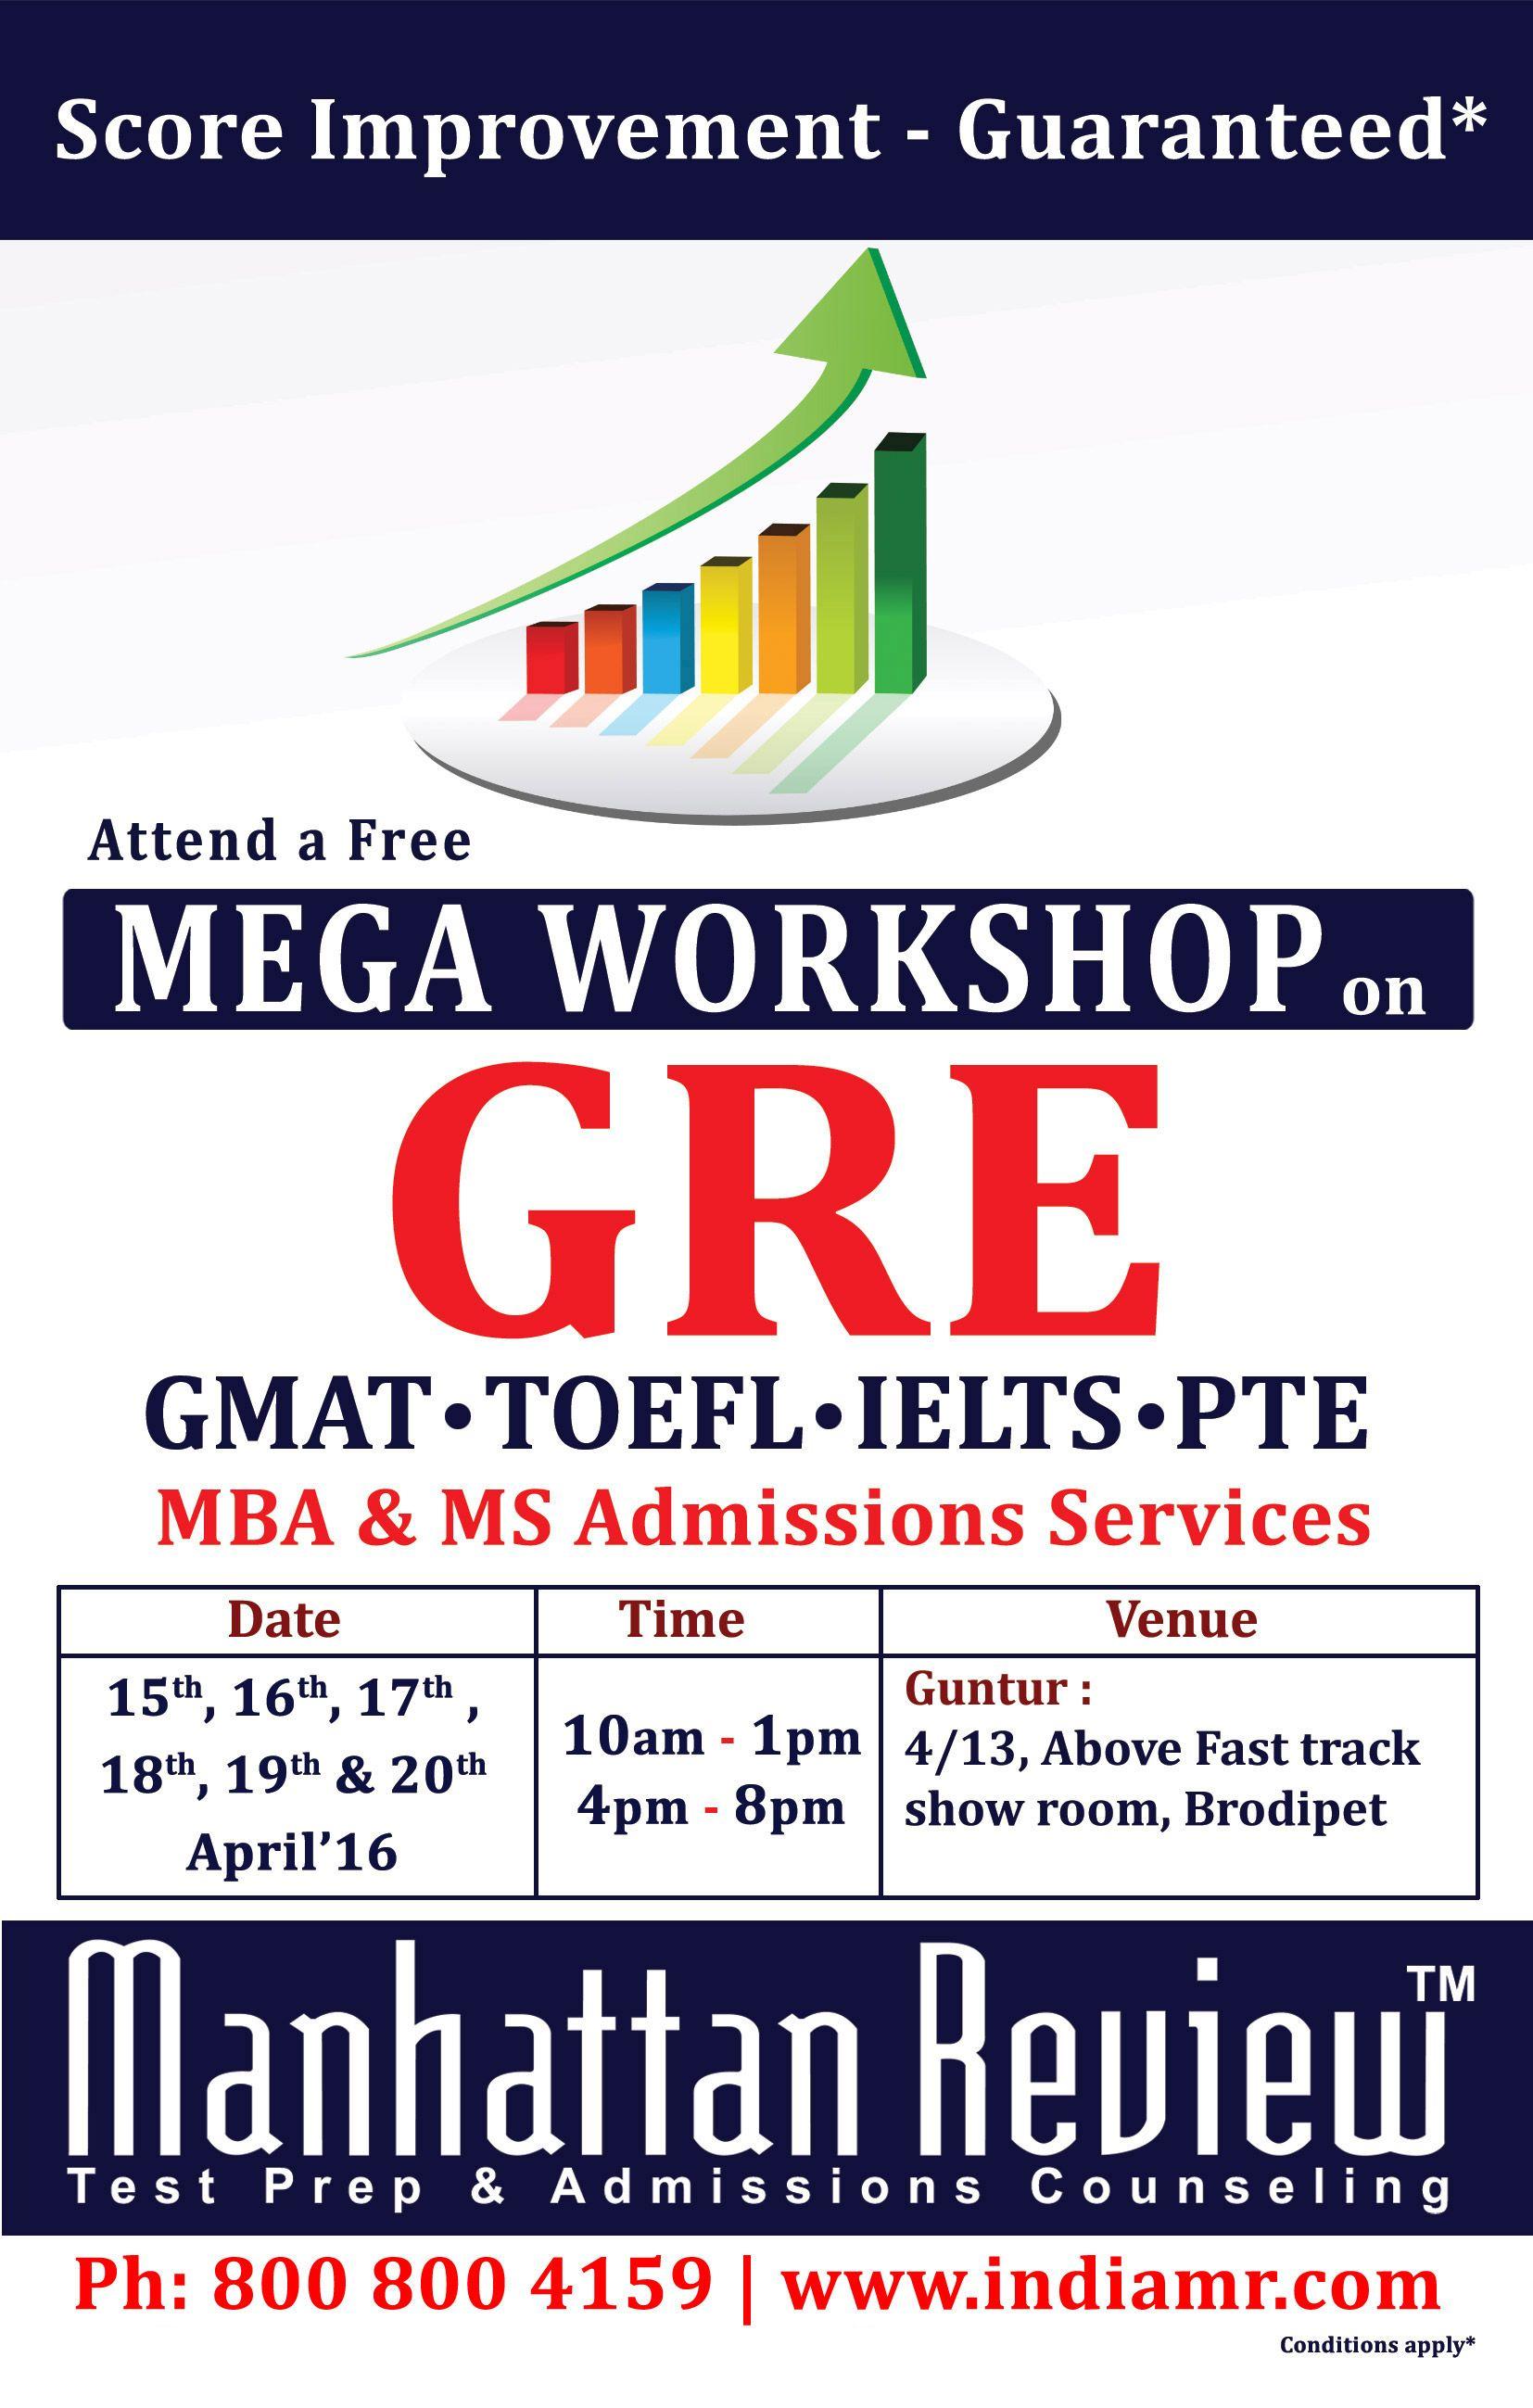 Attend A Free Mega Workshop On Gre Score Improvement Guaranteed